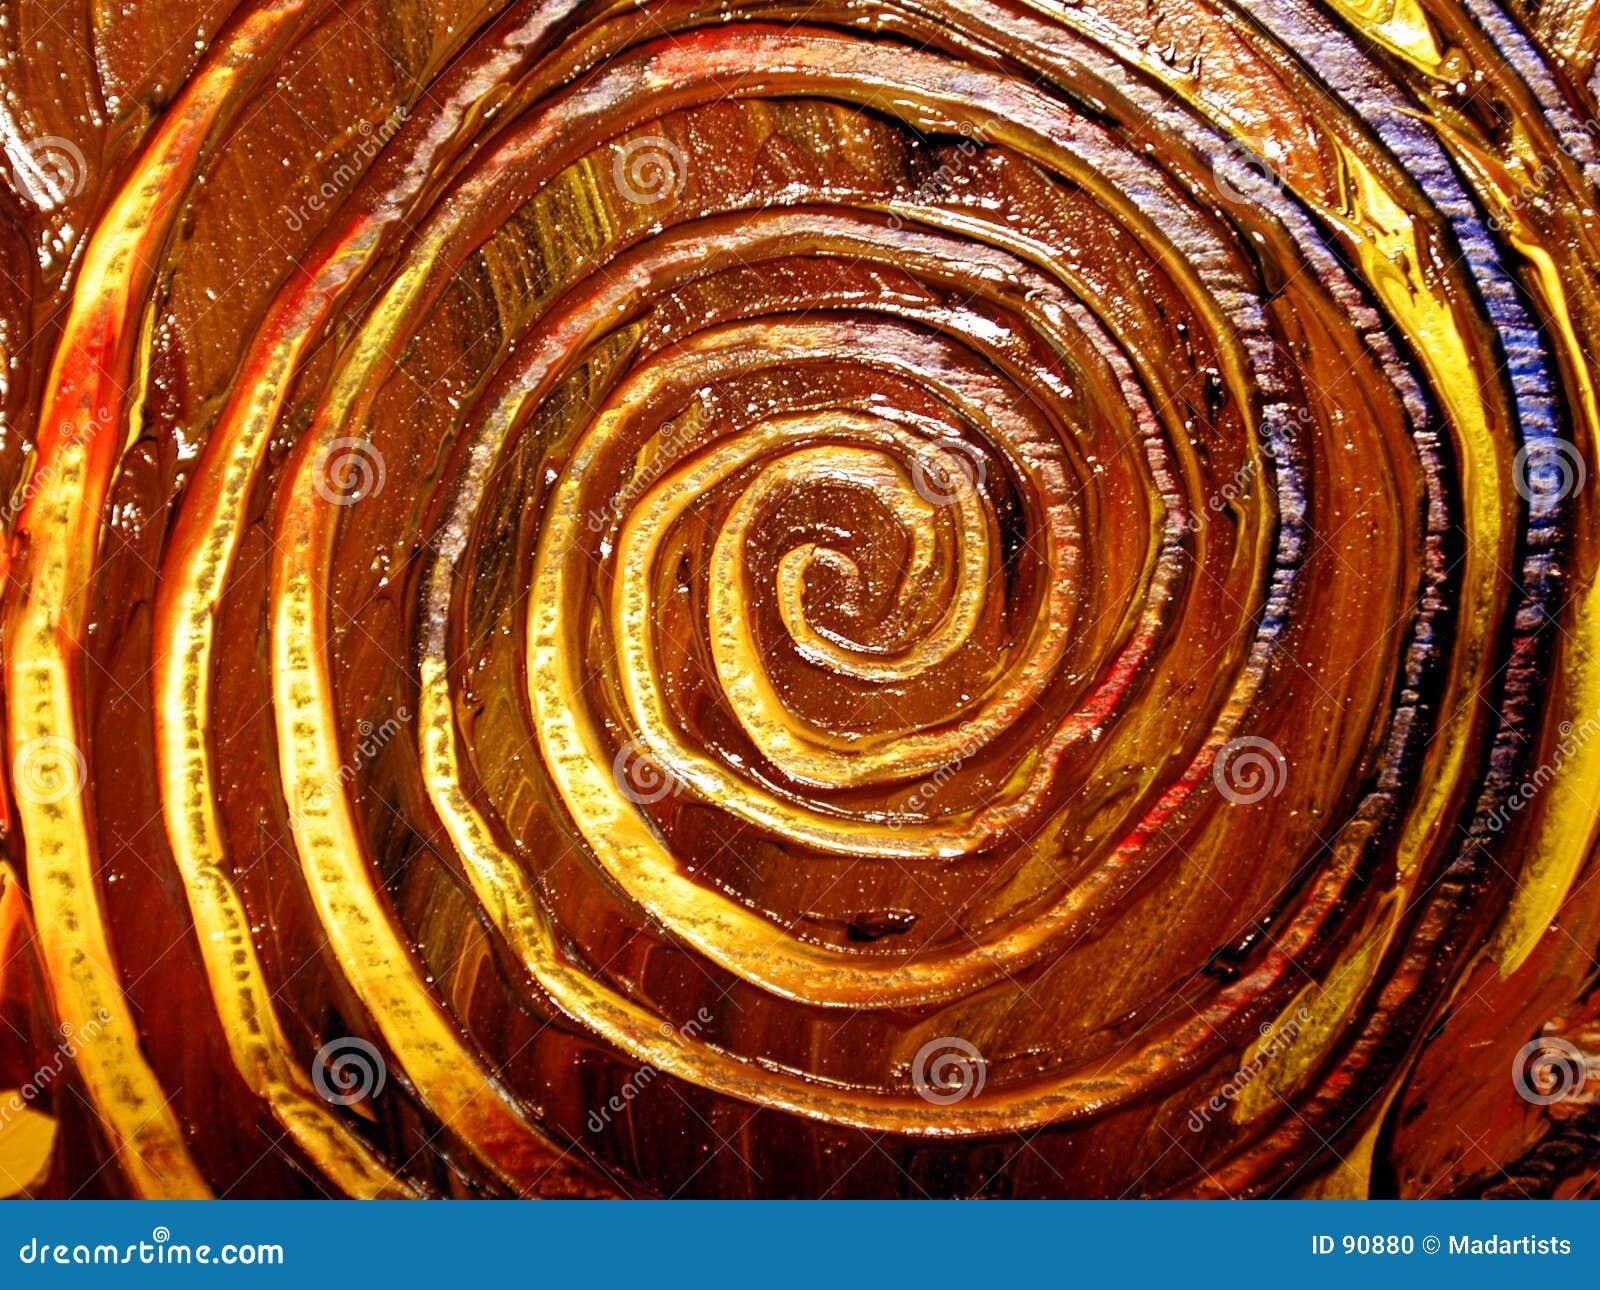 Unique Painted Spiral Patterns